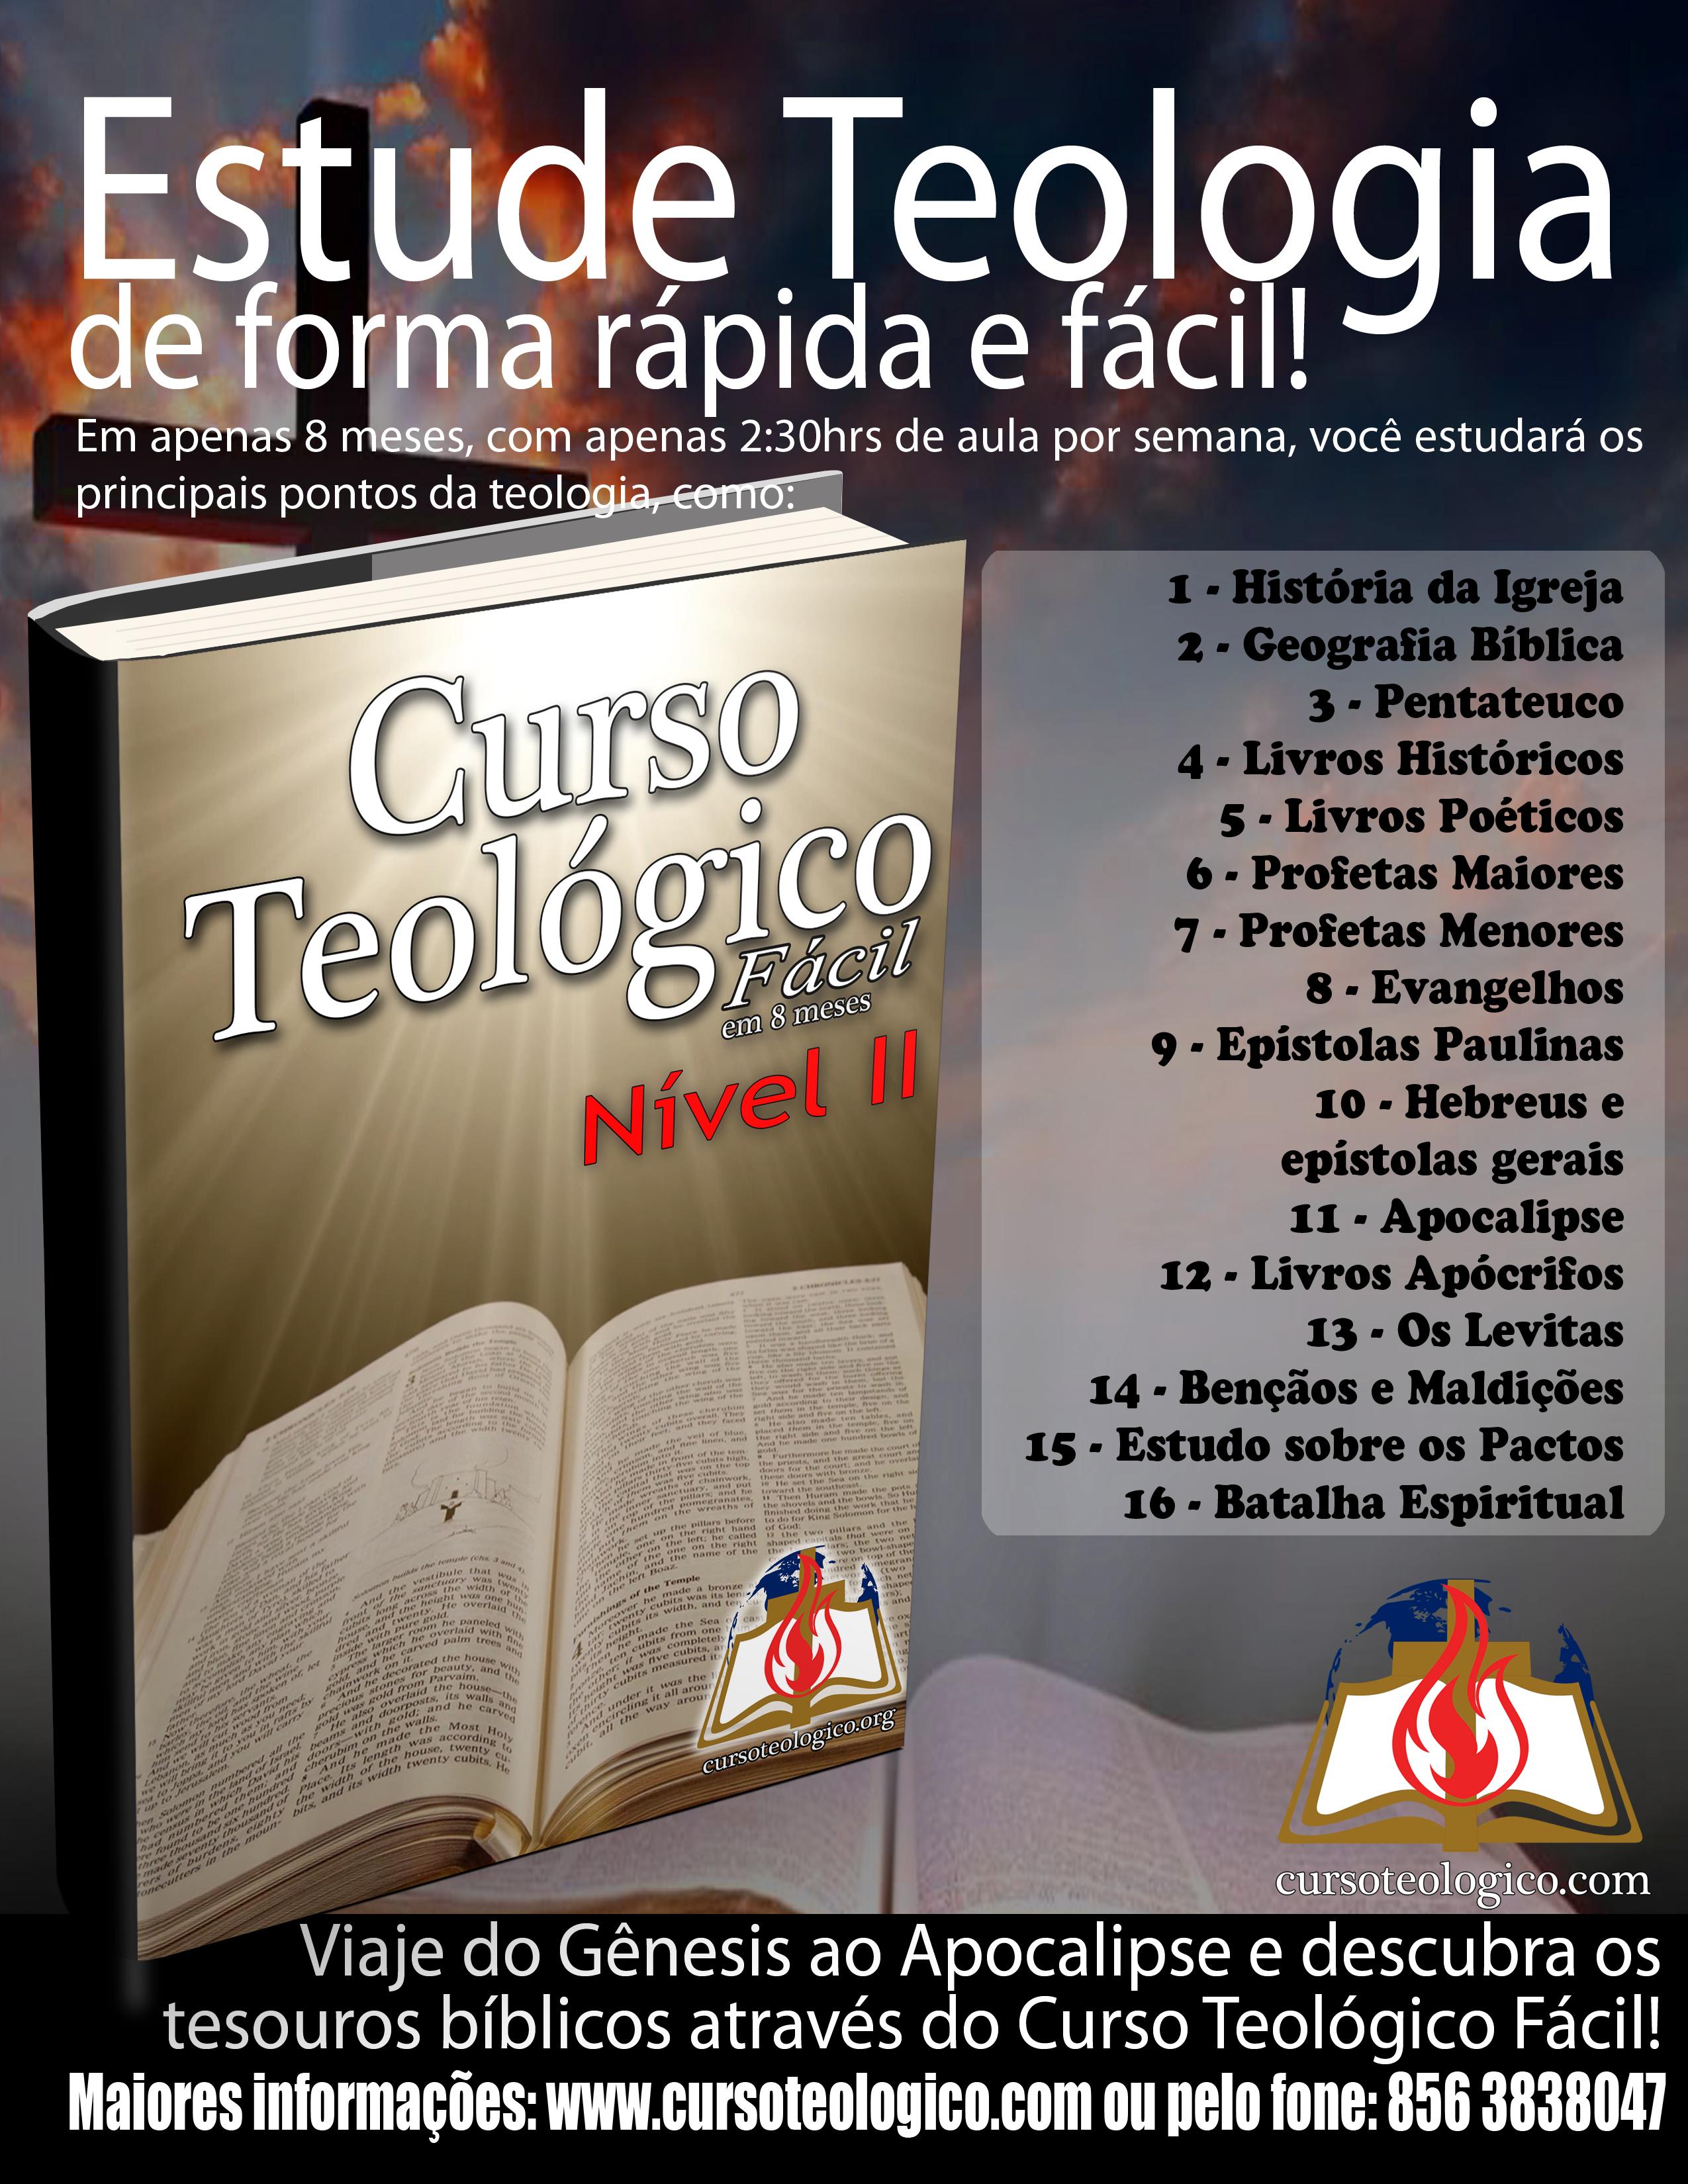 Curso Teológico Fácil - Nível II